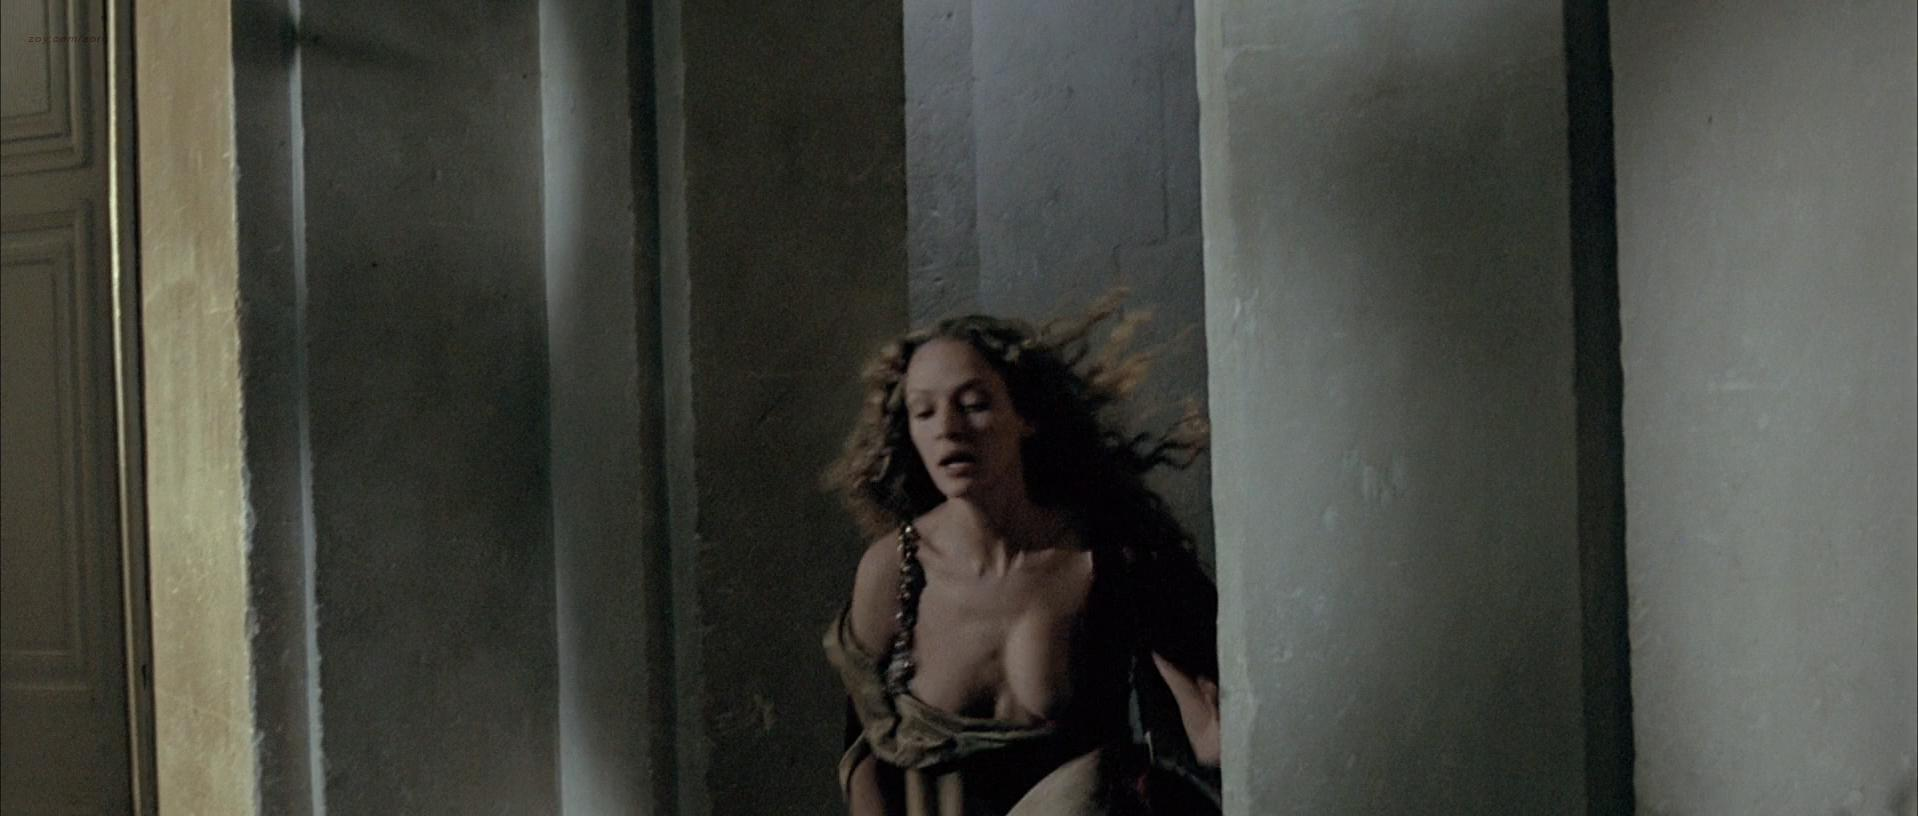 Naked Italian Male Model Uma Thurman